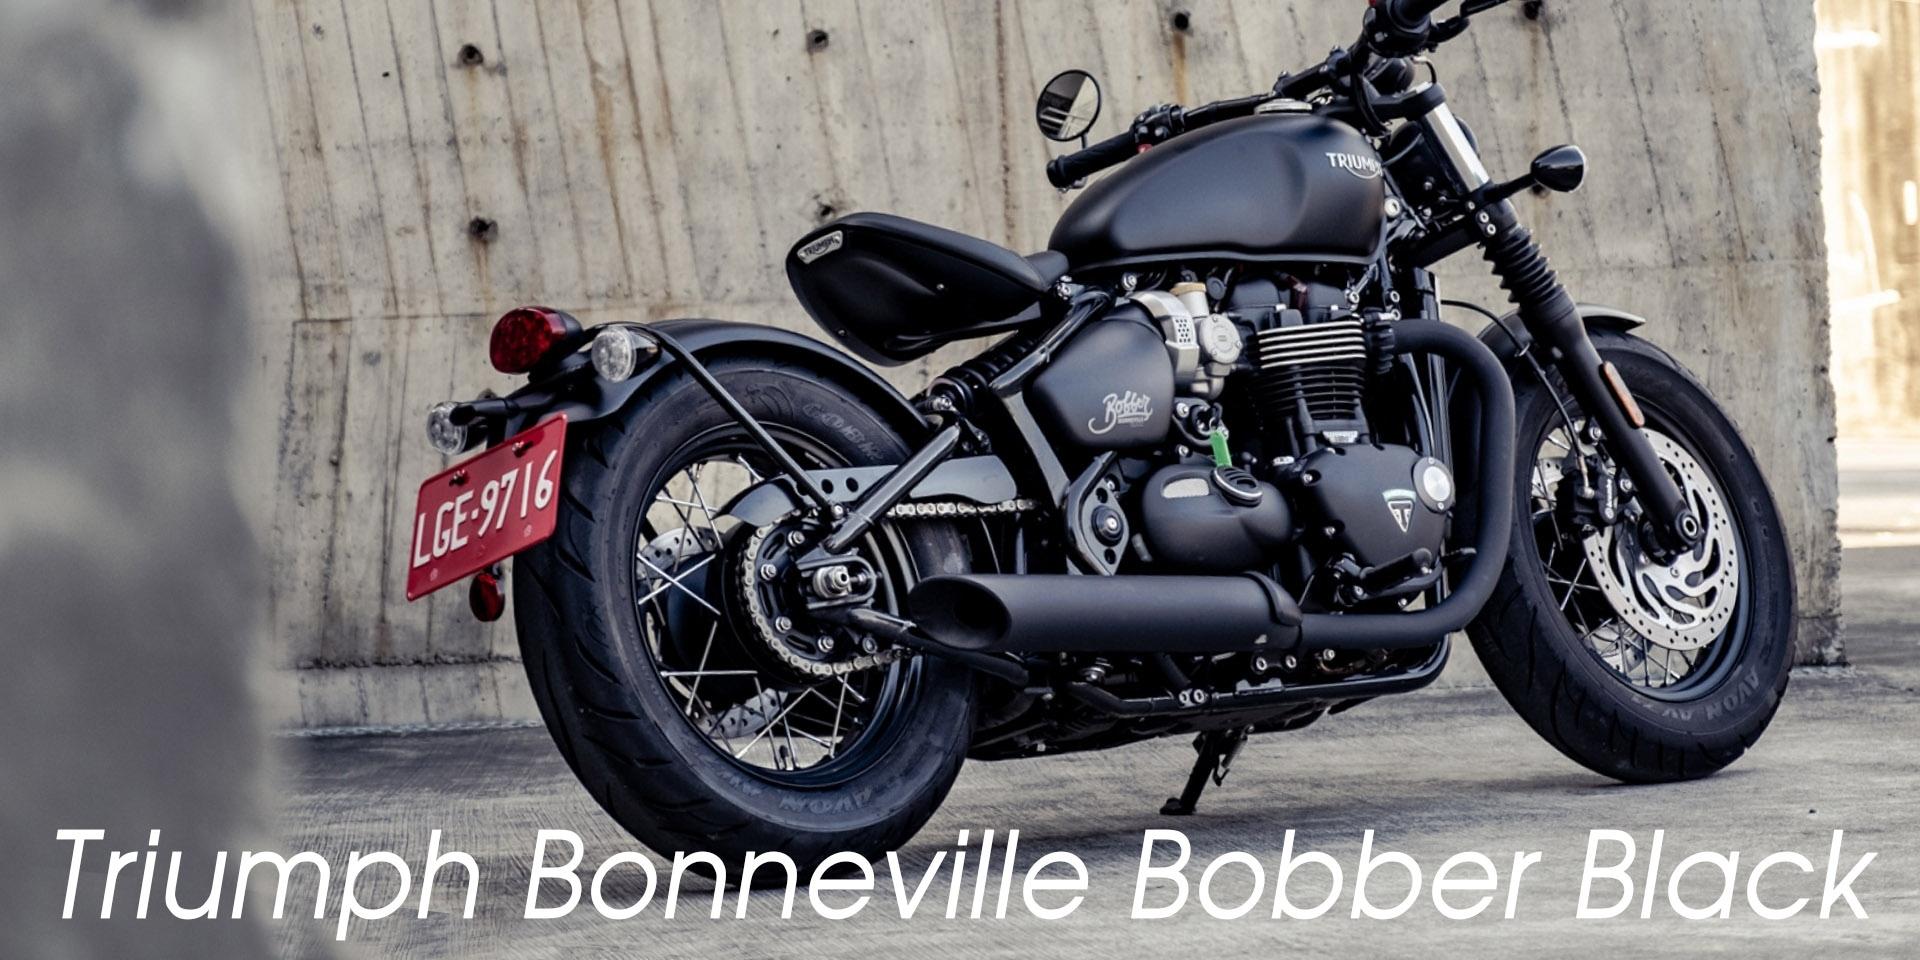 黑暗騎士。Triumph BonnevilleBobber Black